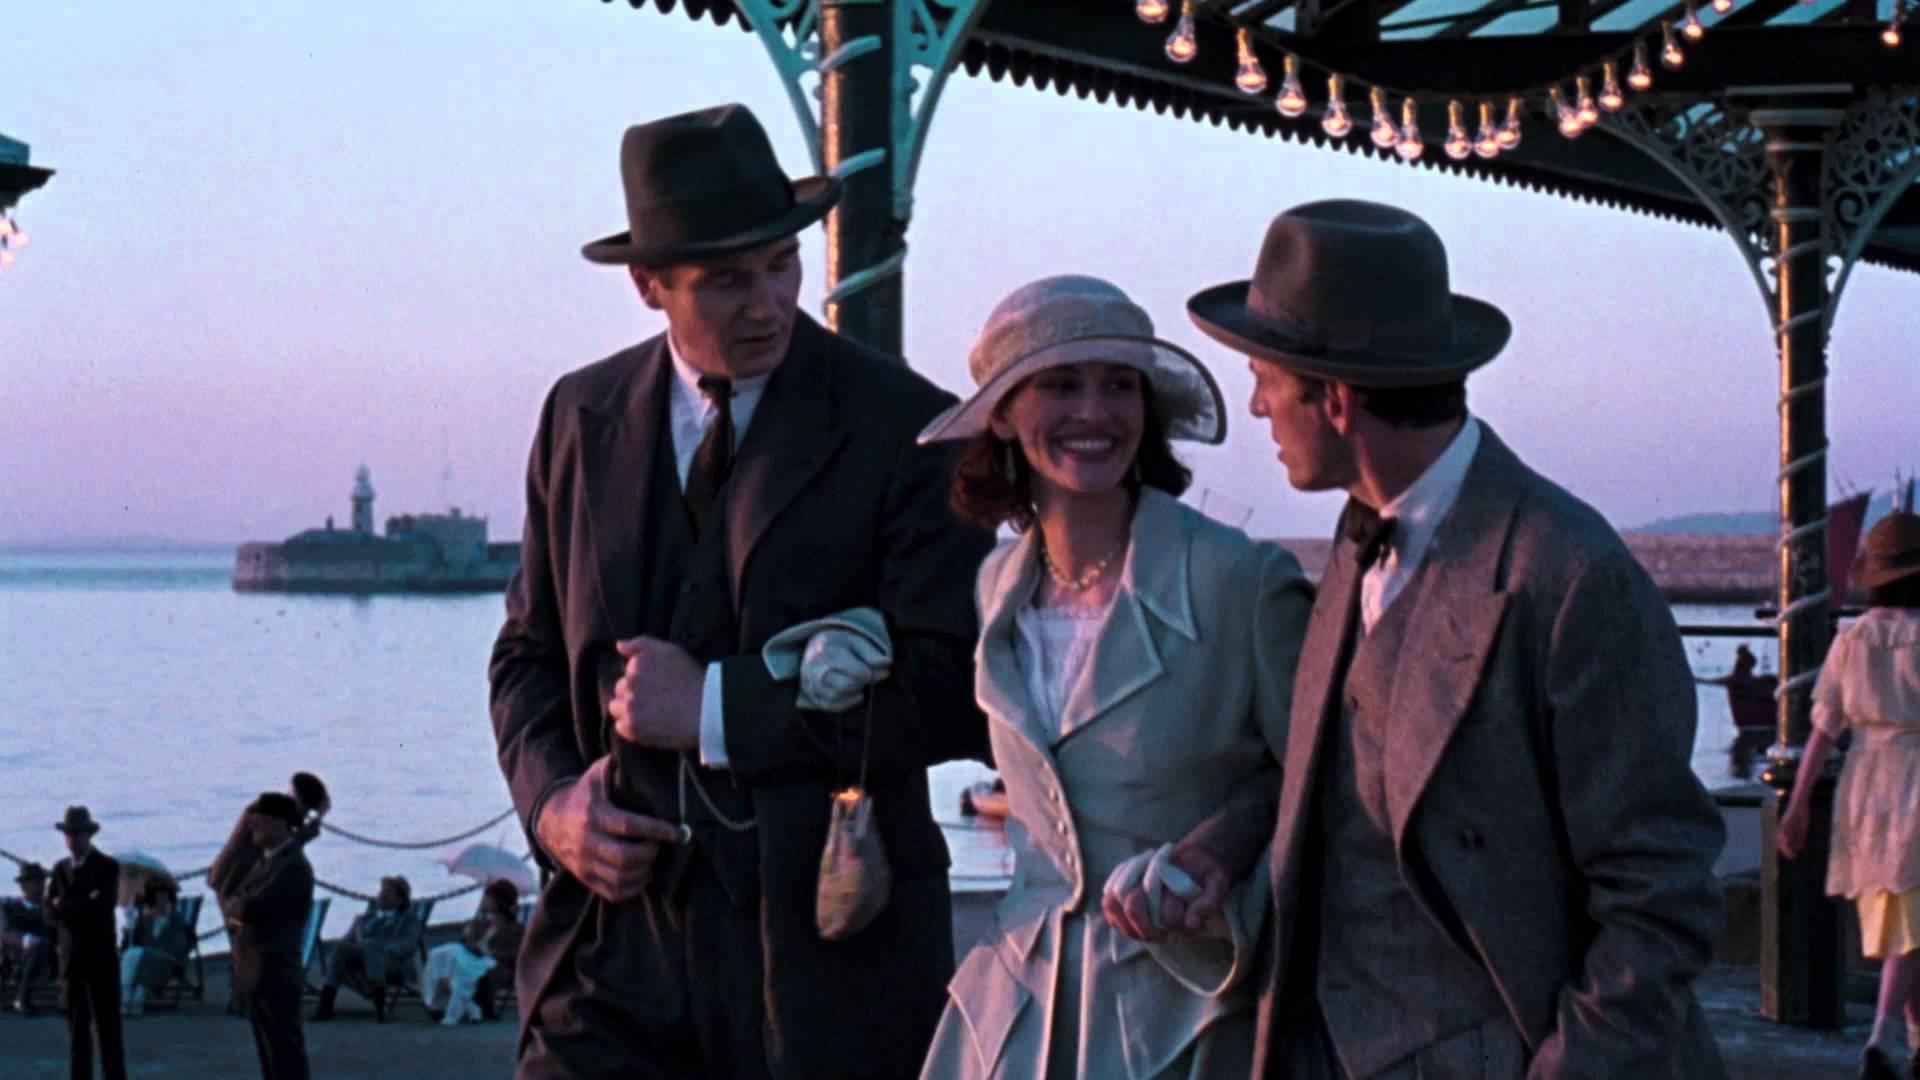 Scene from irish movie Michael Collins.